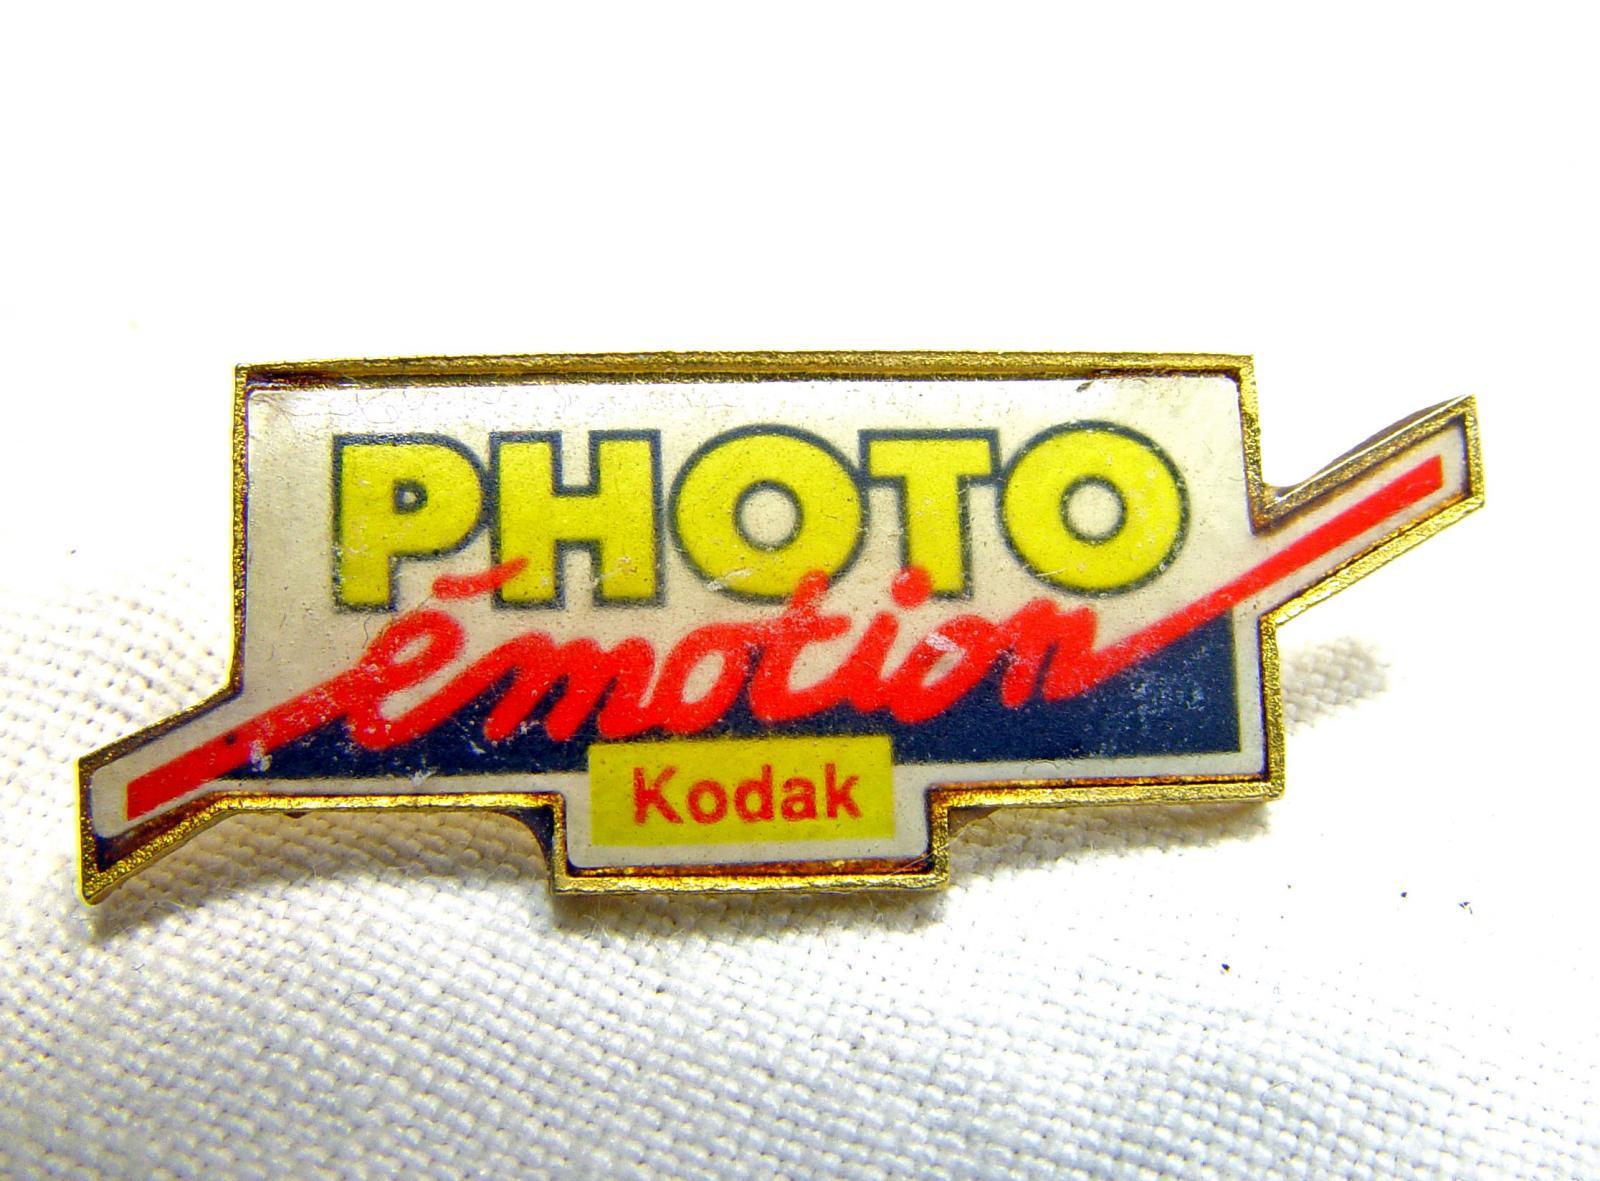 Wallpaper 2496-2  KODAK  Pins  Photo emotion, collection AMI Appareils photos